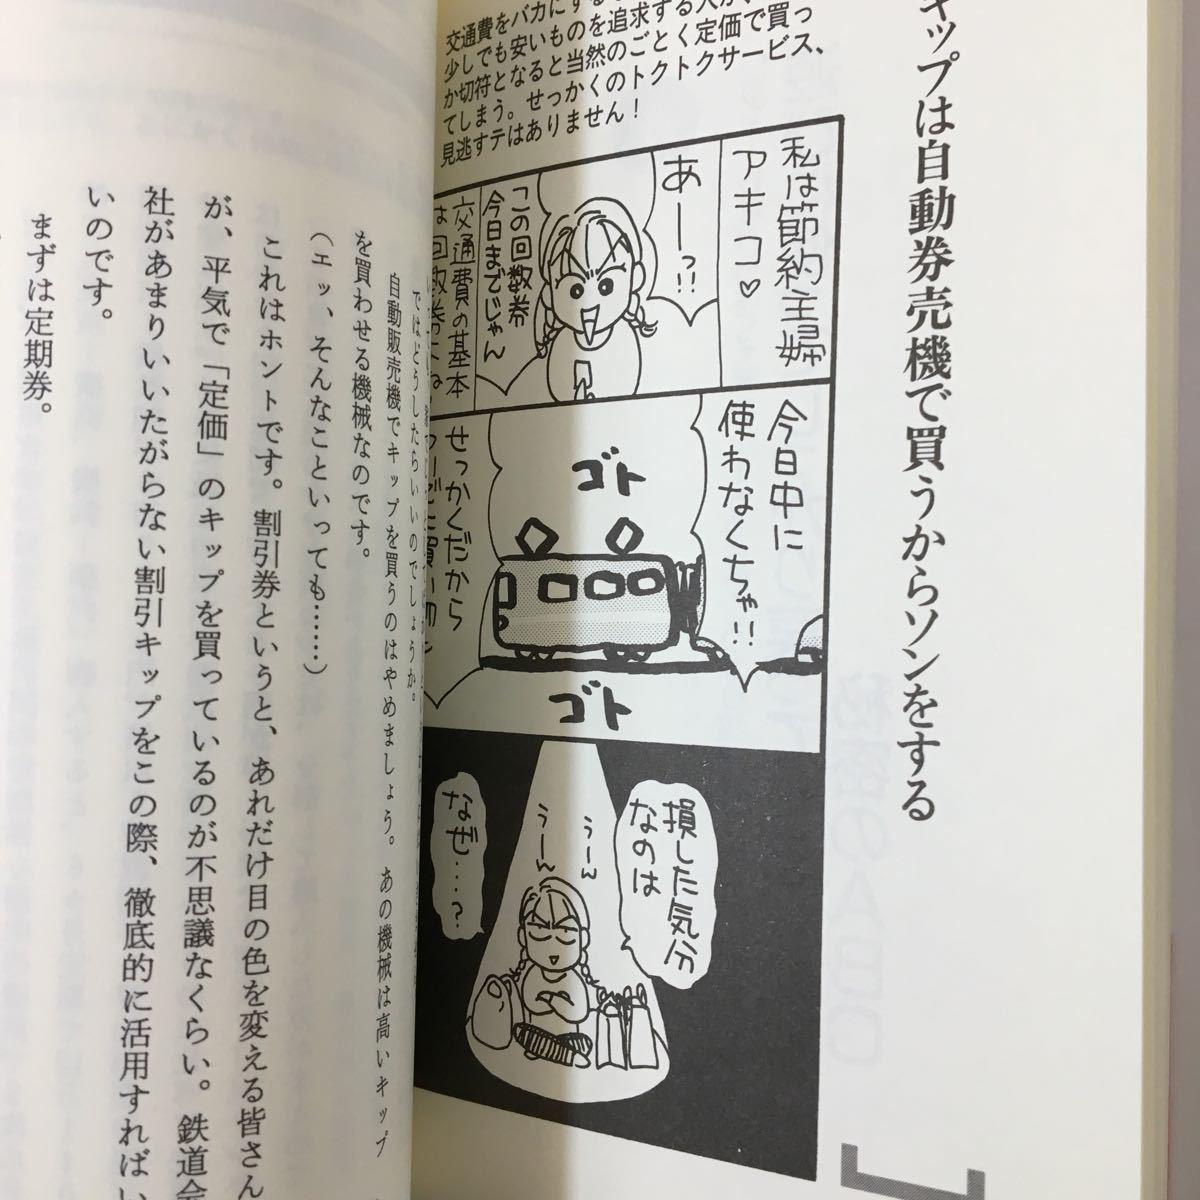 zaa-42 毎日お得なやりくり秘伝帳―安く、楽しく、家計を浮かす知恵とワザ  荻原 博子 (著)(SEISHUN SUPER BOOKS) 単行本 1996